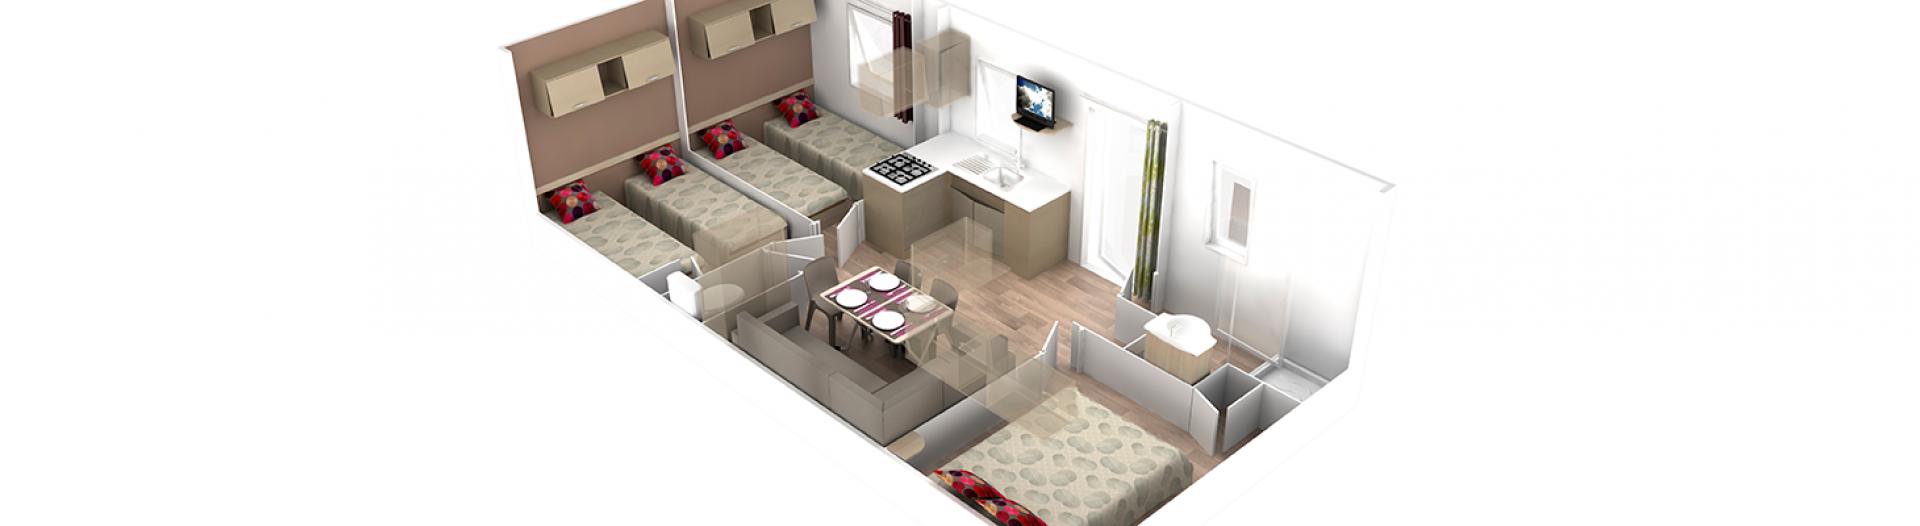 plan-mobil-home-3-chambres